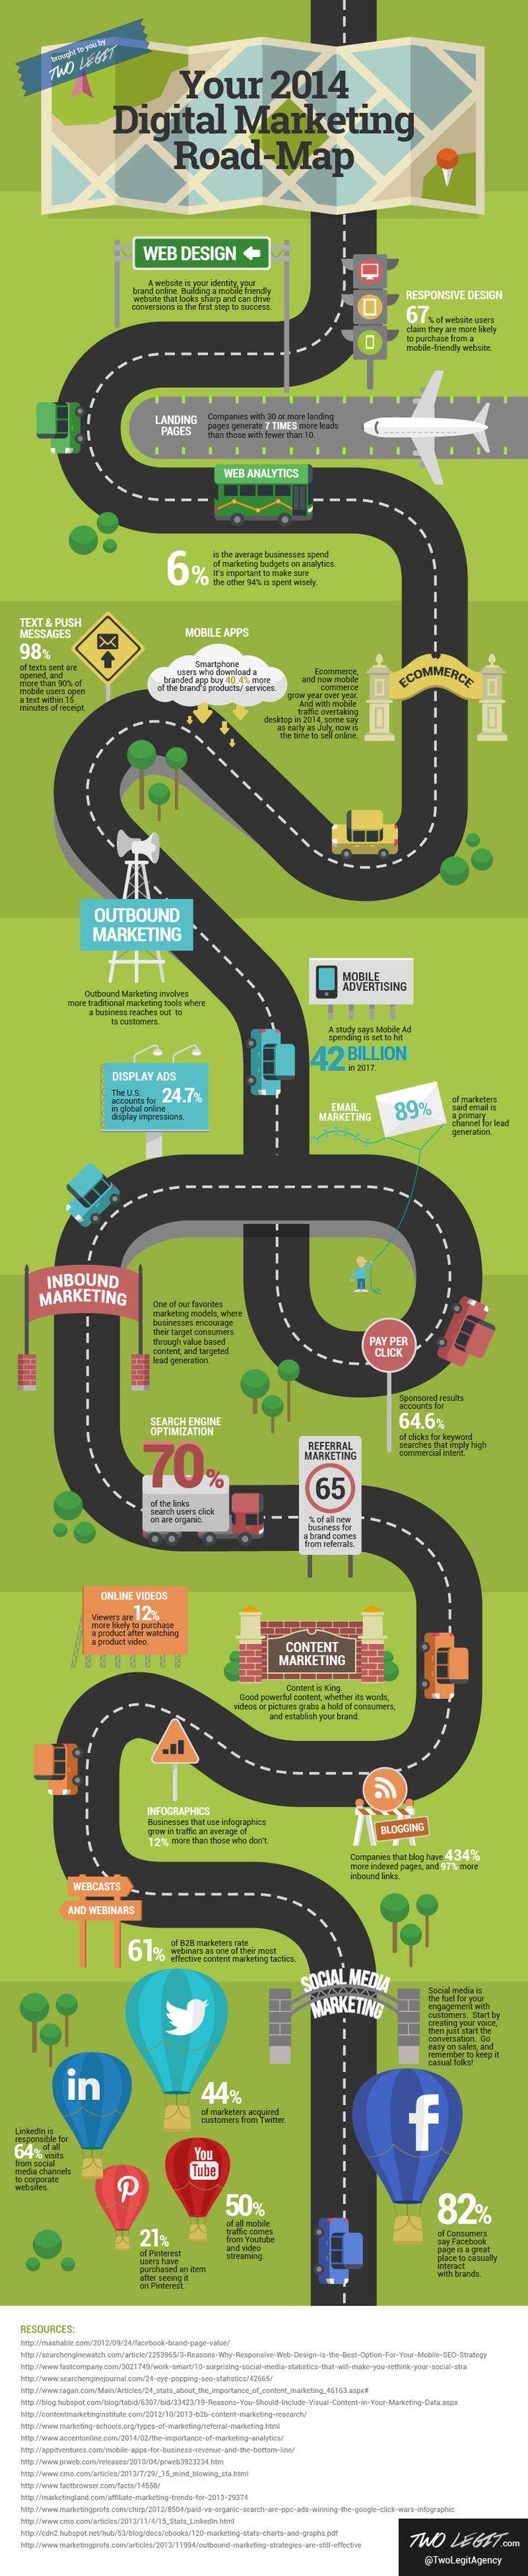 Your Digital Marketing Roadmap - infographic